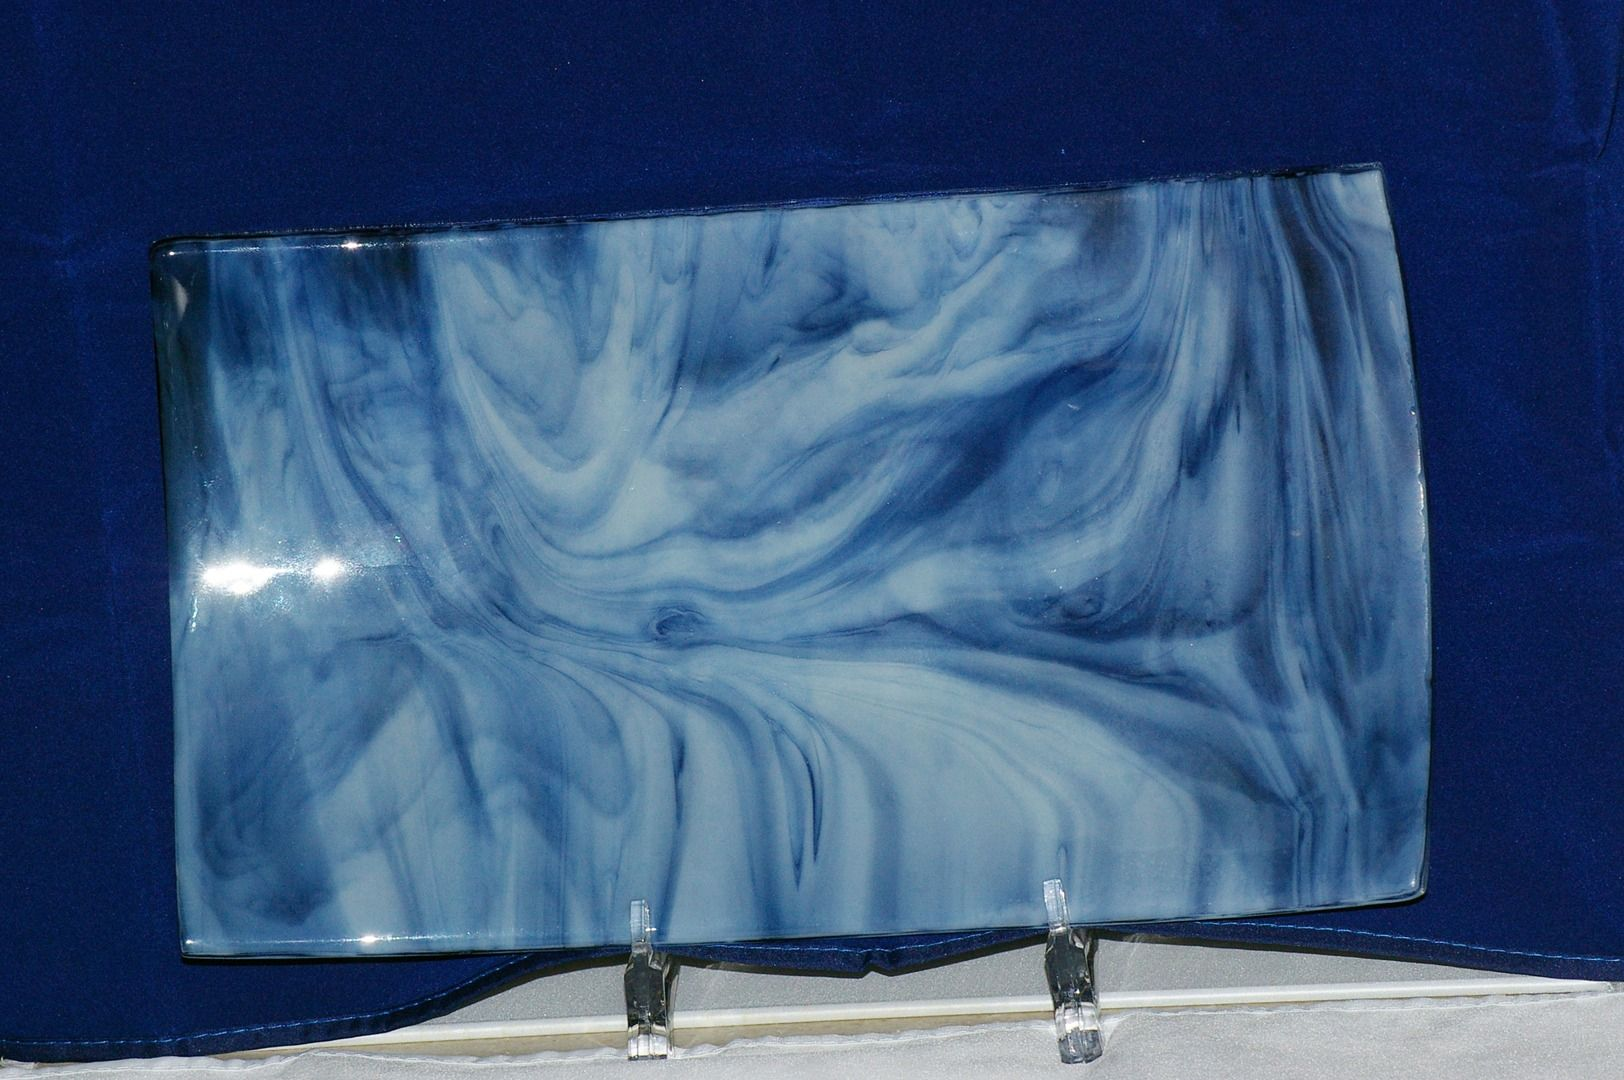 approx 9x 12 serving tray blue swirls. www.castlewynd.com